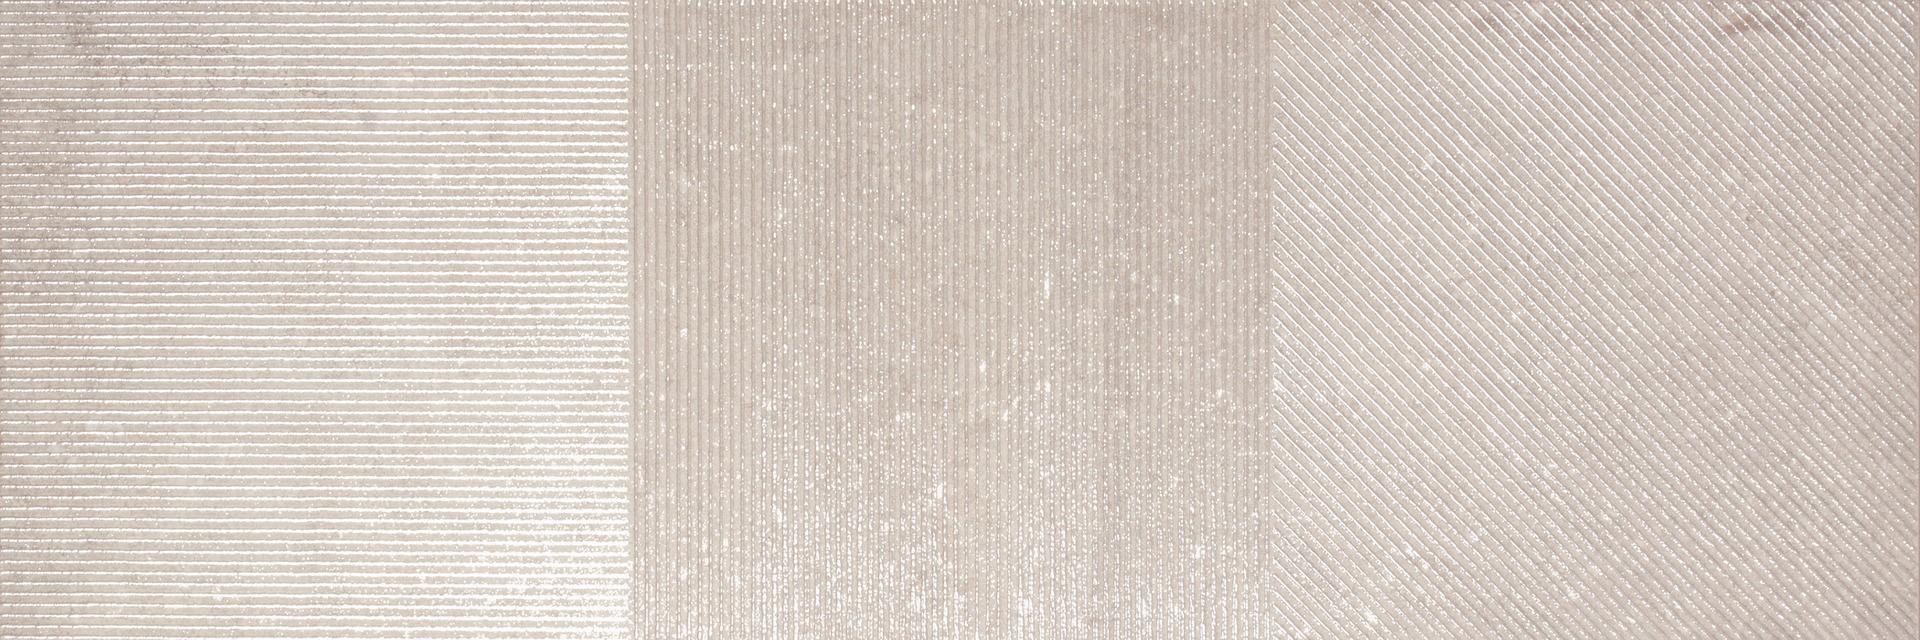 Obklad Eclat Grey 30x90 cm, mat